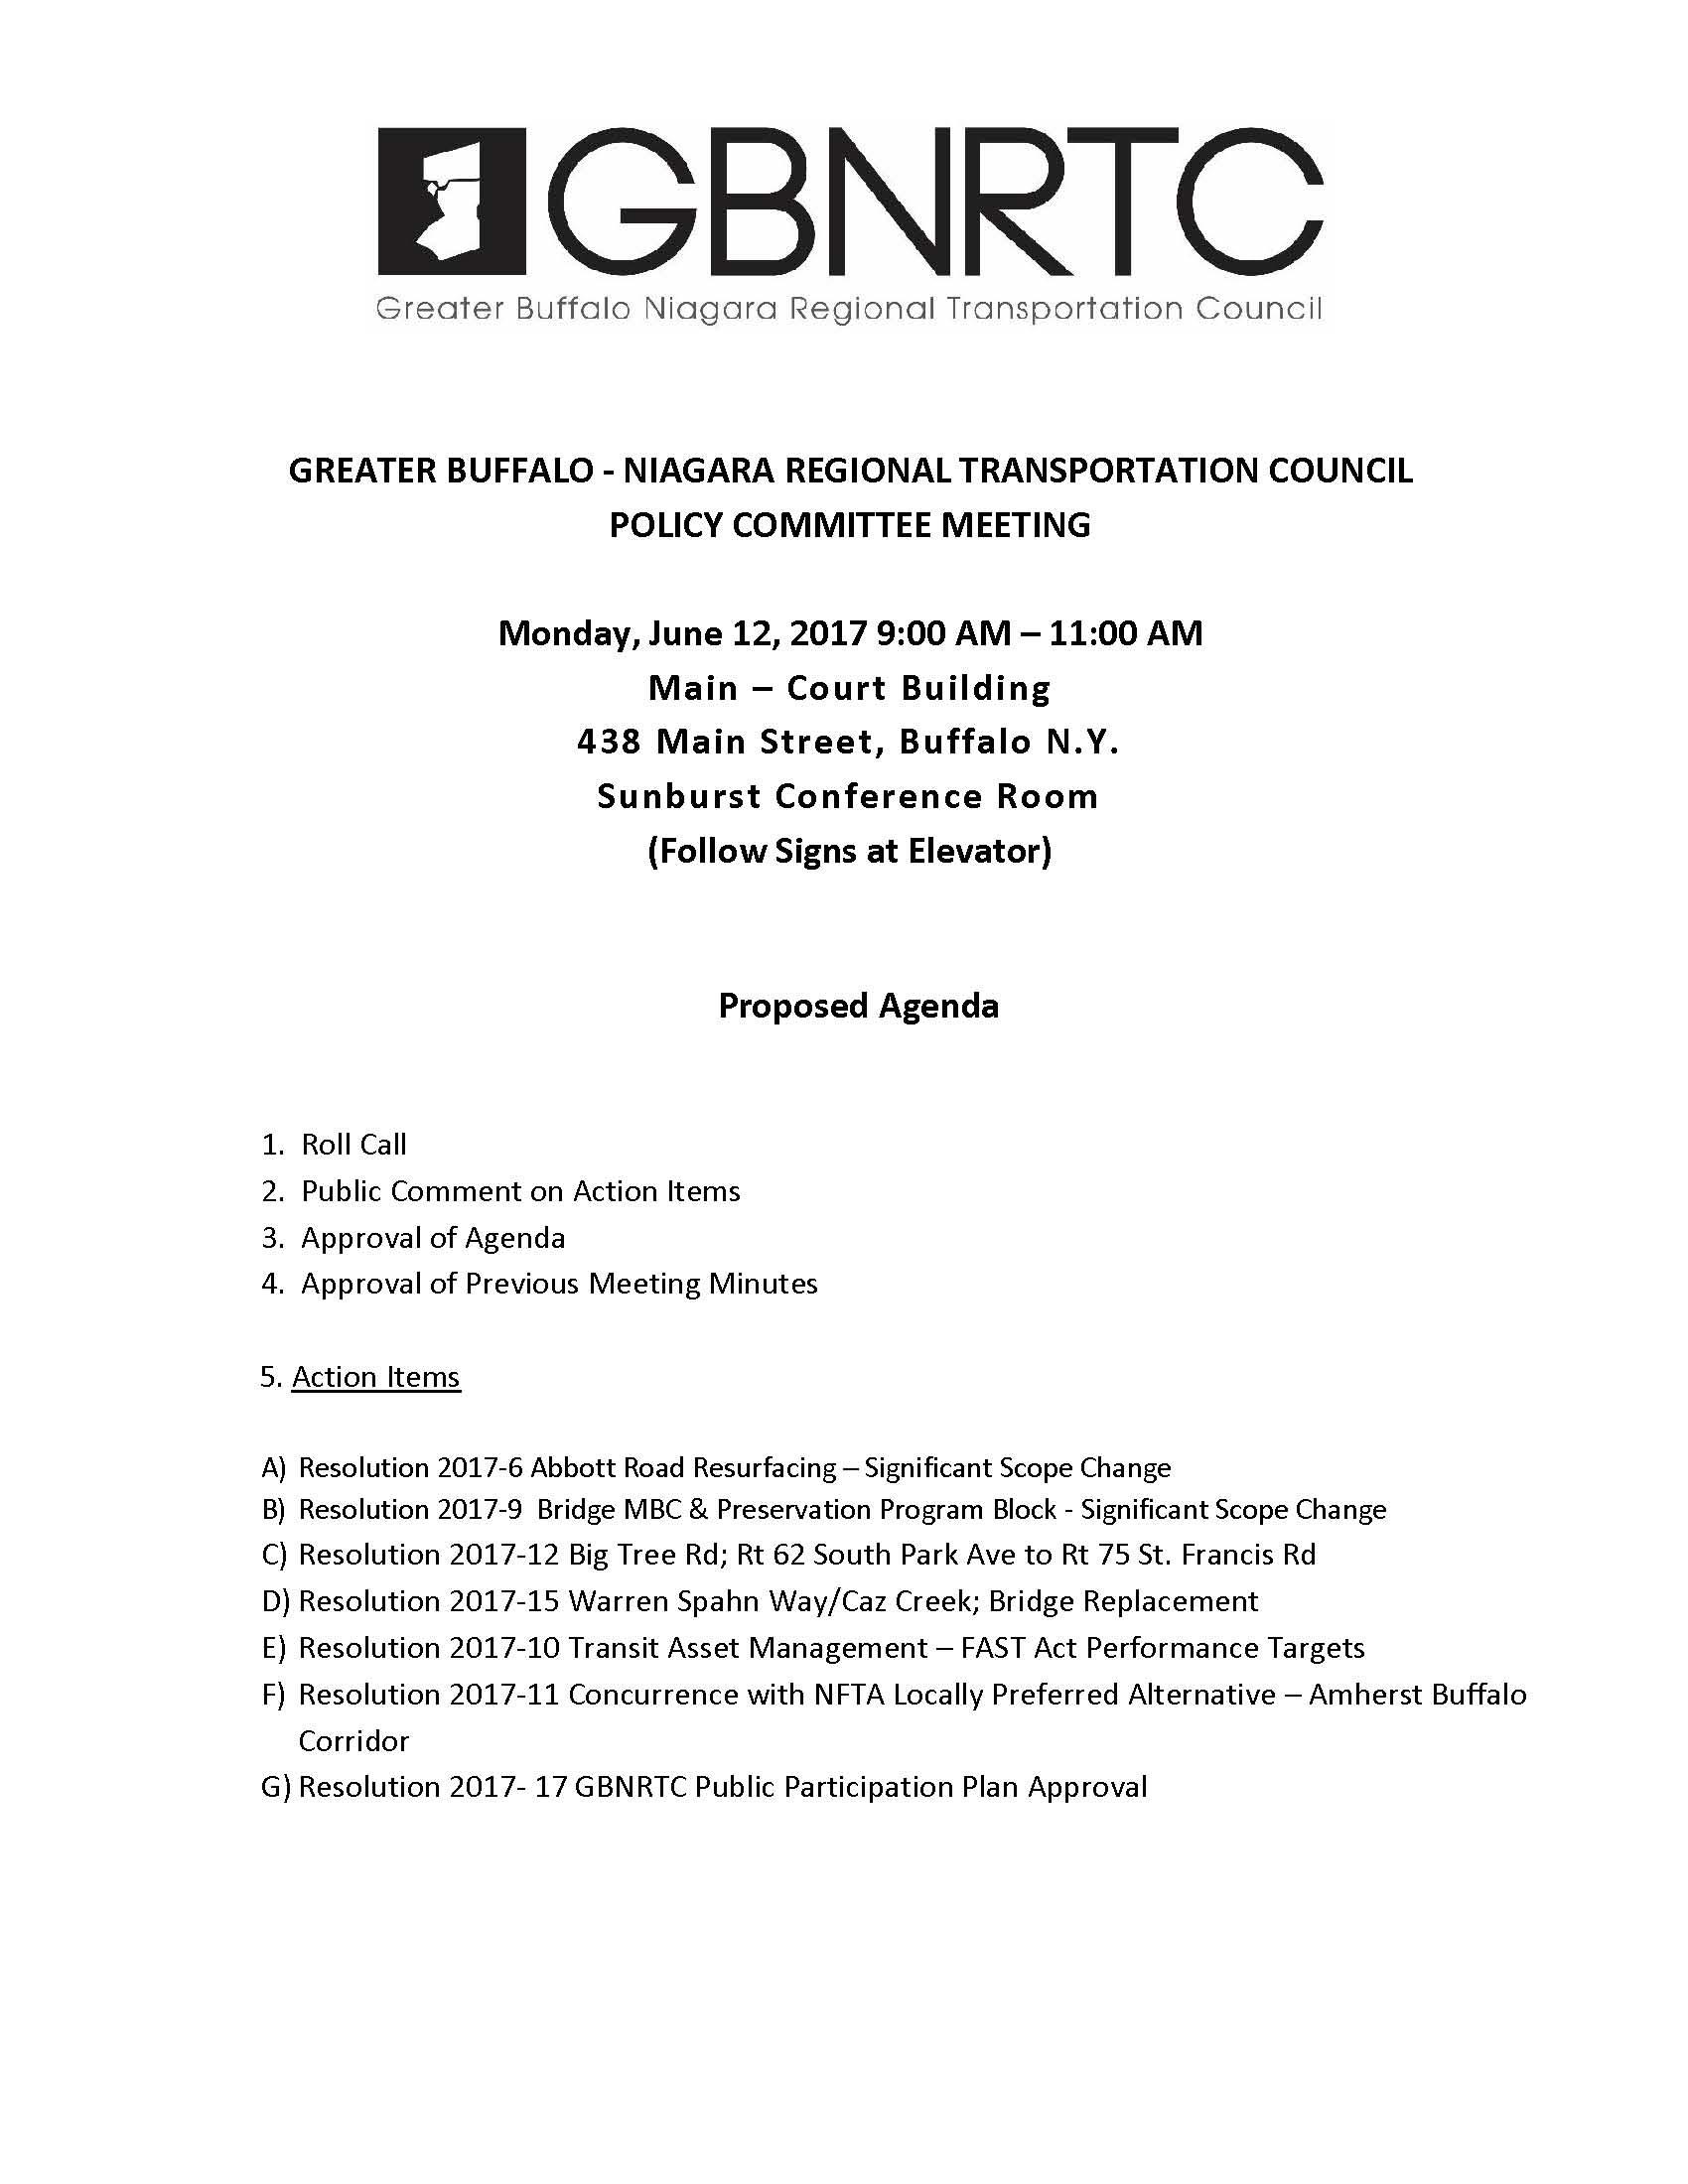 Policy Committee Draft Agenda June 12, 2017_Page_1.jpg